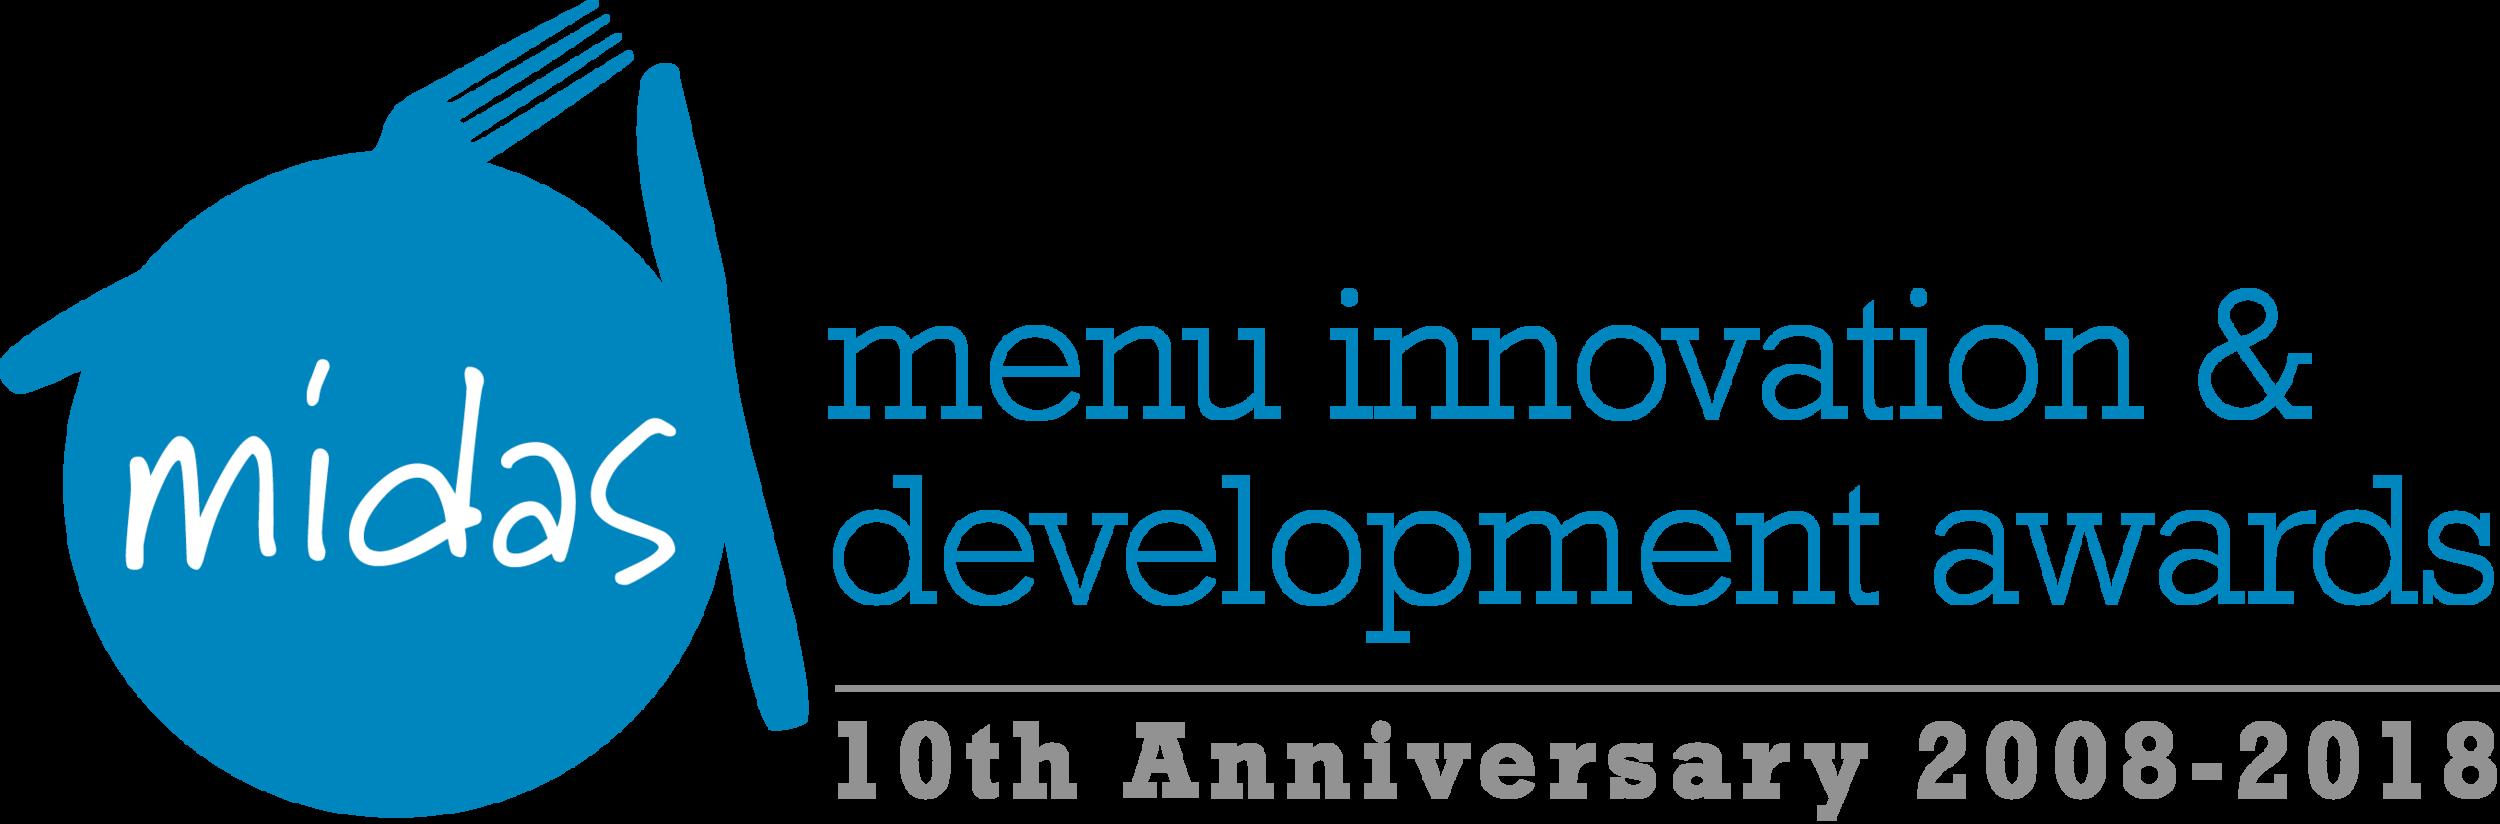 MIDAS 10yr logo.png